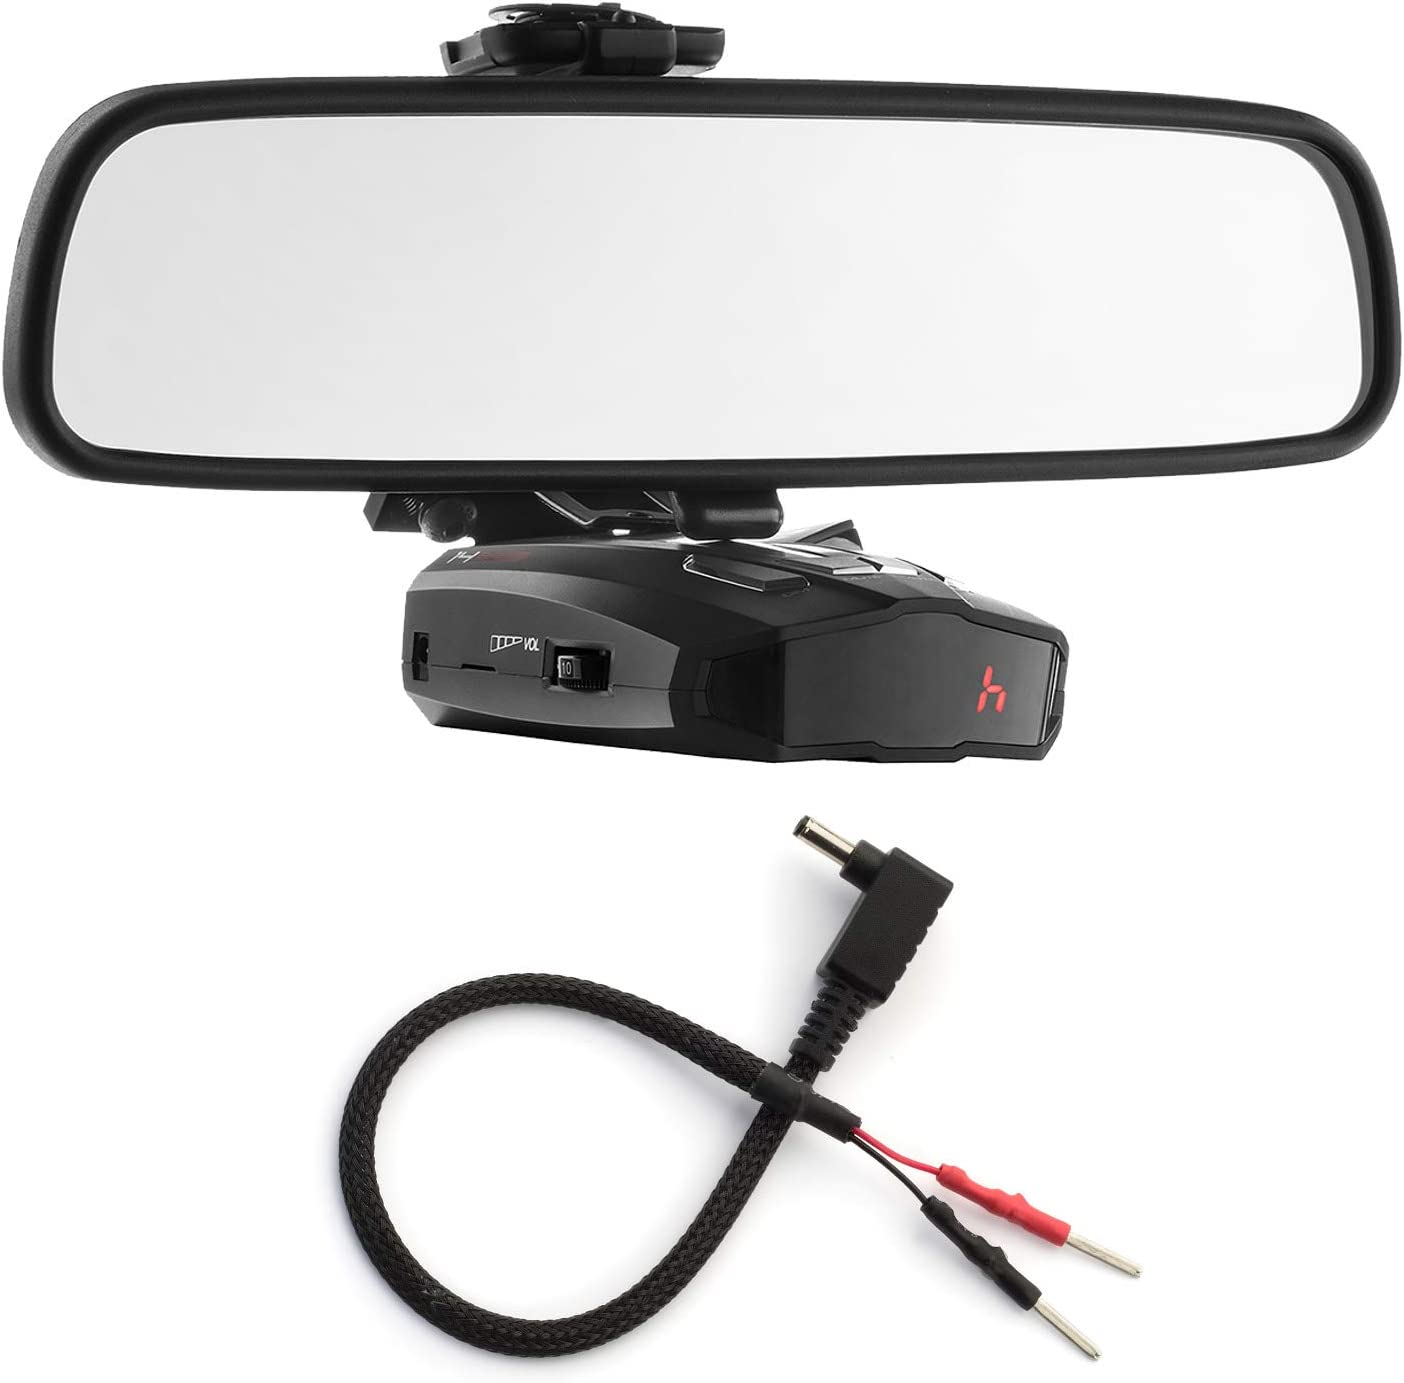 Mirror Mount Bracket Mirror Wire Power Cord for Cobra Radar Detectors